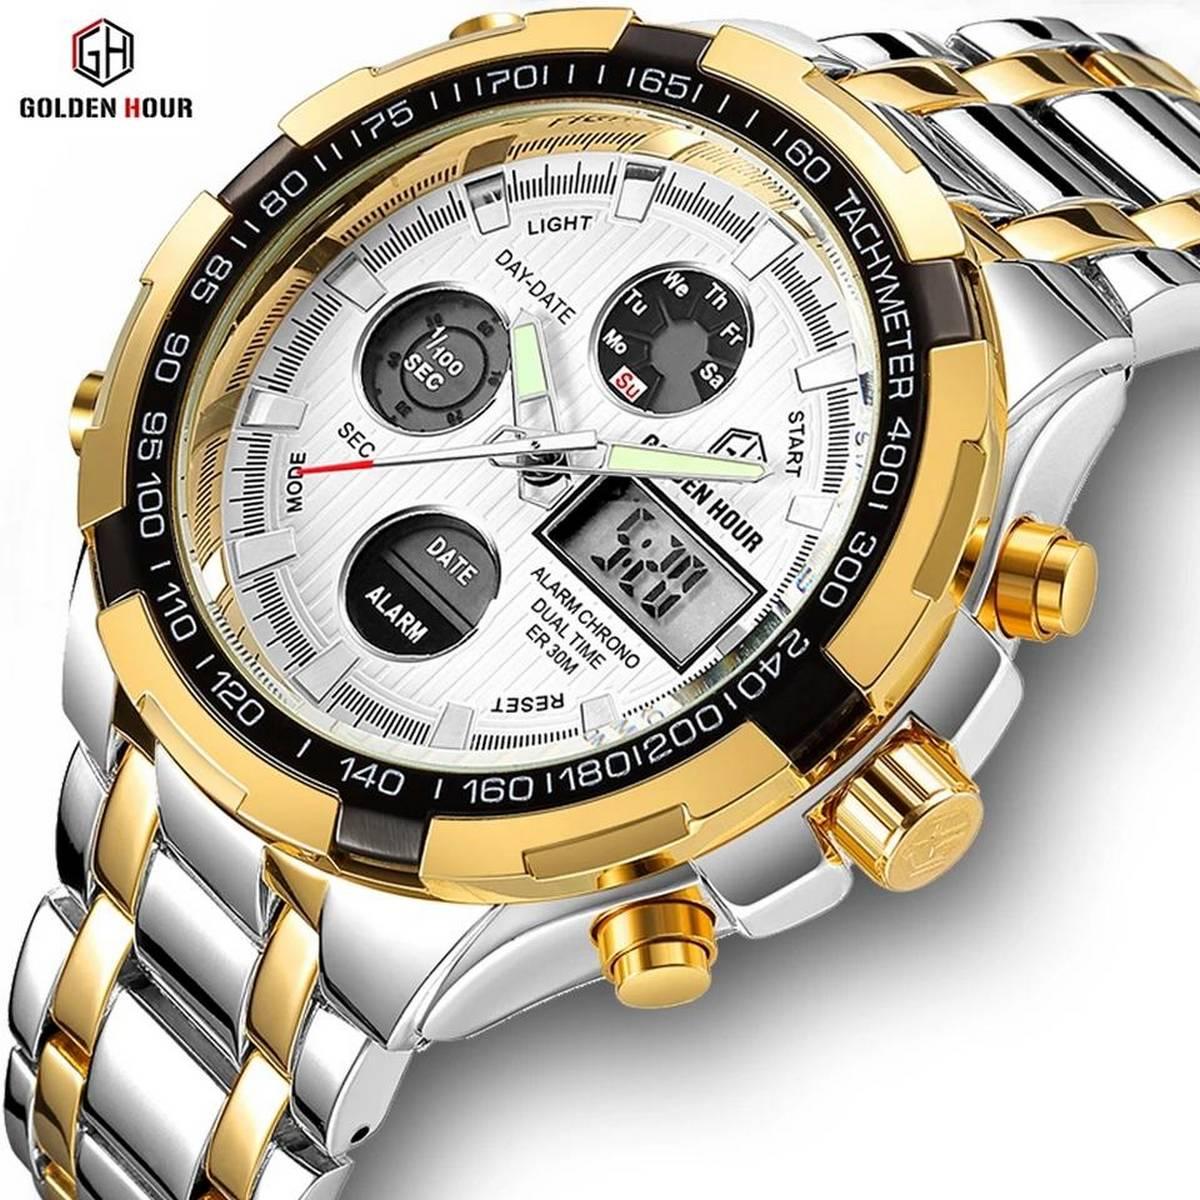 GOLDENHOUR 100% Chronograph Watch Luxury Brand Watch Gold Waterproof Watch Quartz Dual Display Digital Watch Mens Military Watch Sports Watch